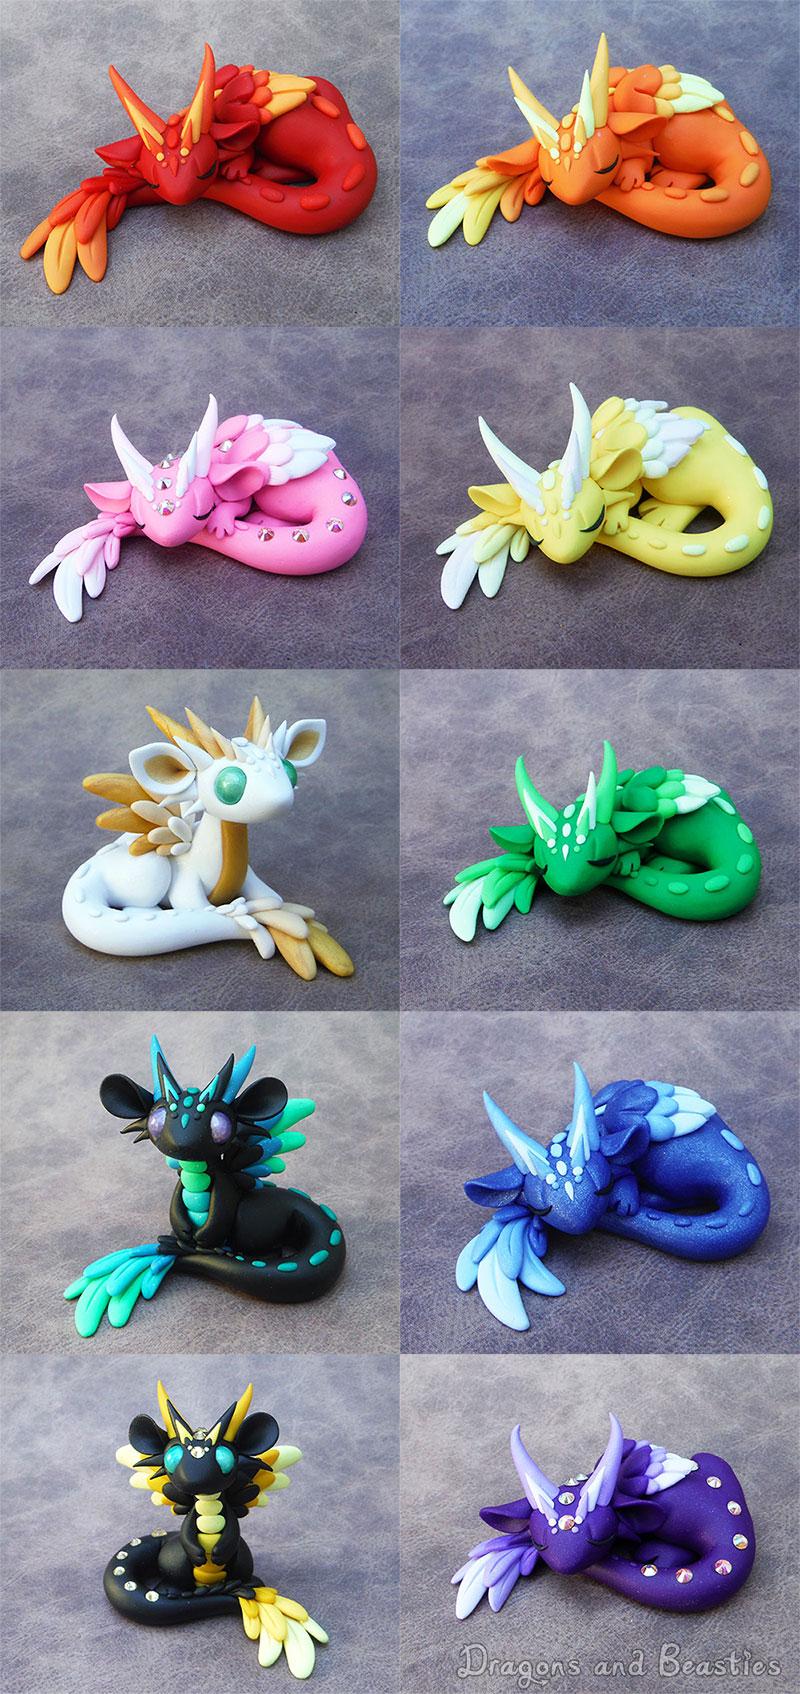 Angel Dragon Sale March 28 by DragonsAndBeasties